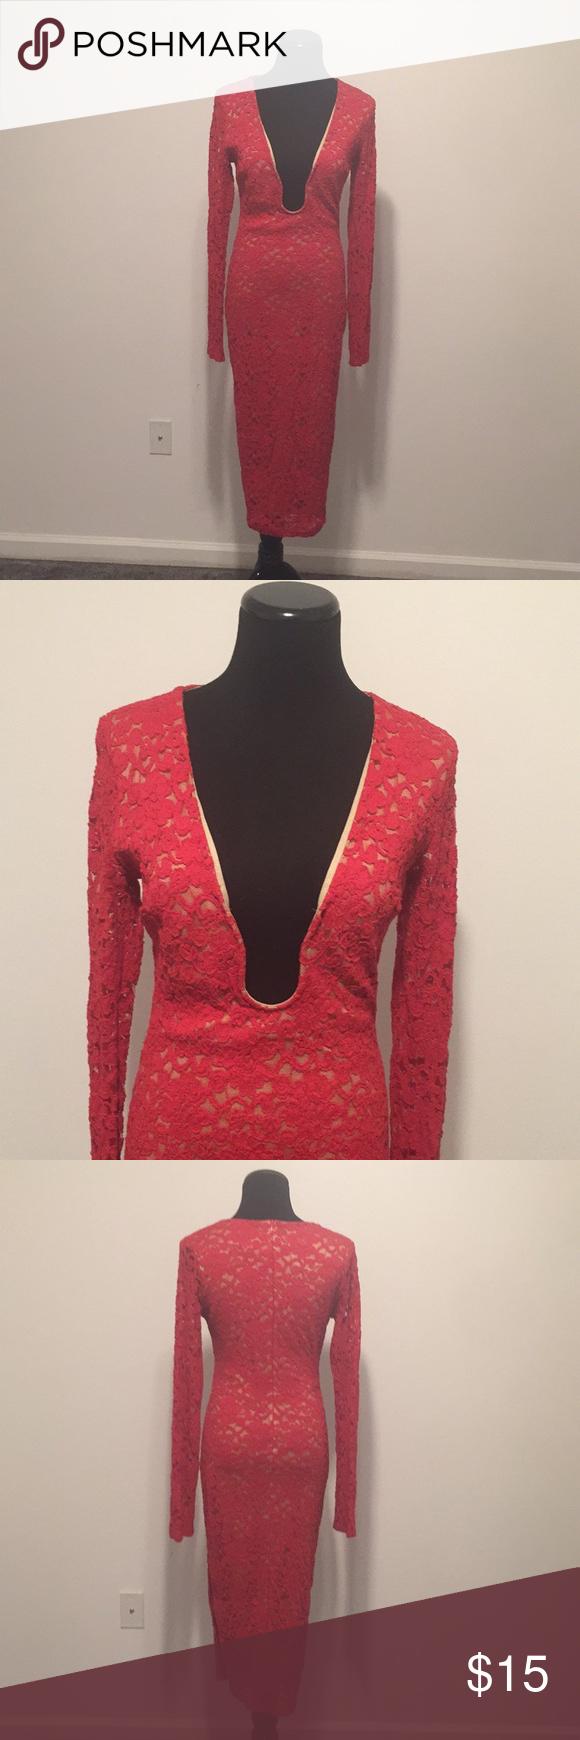 Hms Long Sleeve Dress Long Sleeve Dress Hot Miami Styles Dresses Dresses [ 1740 x 580 Pixel ]